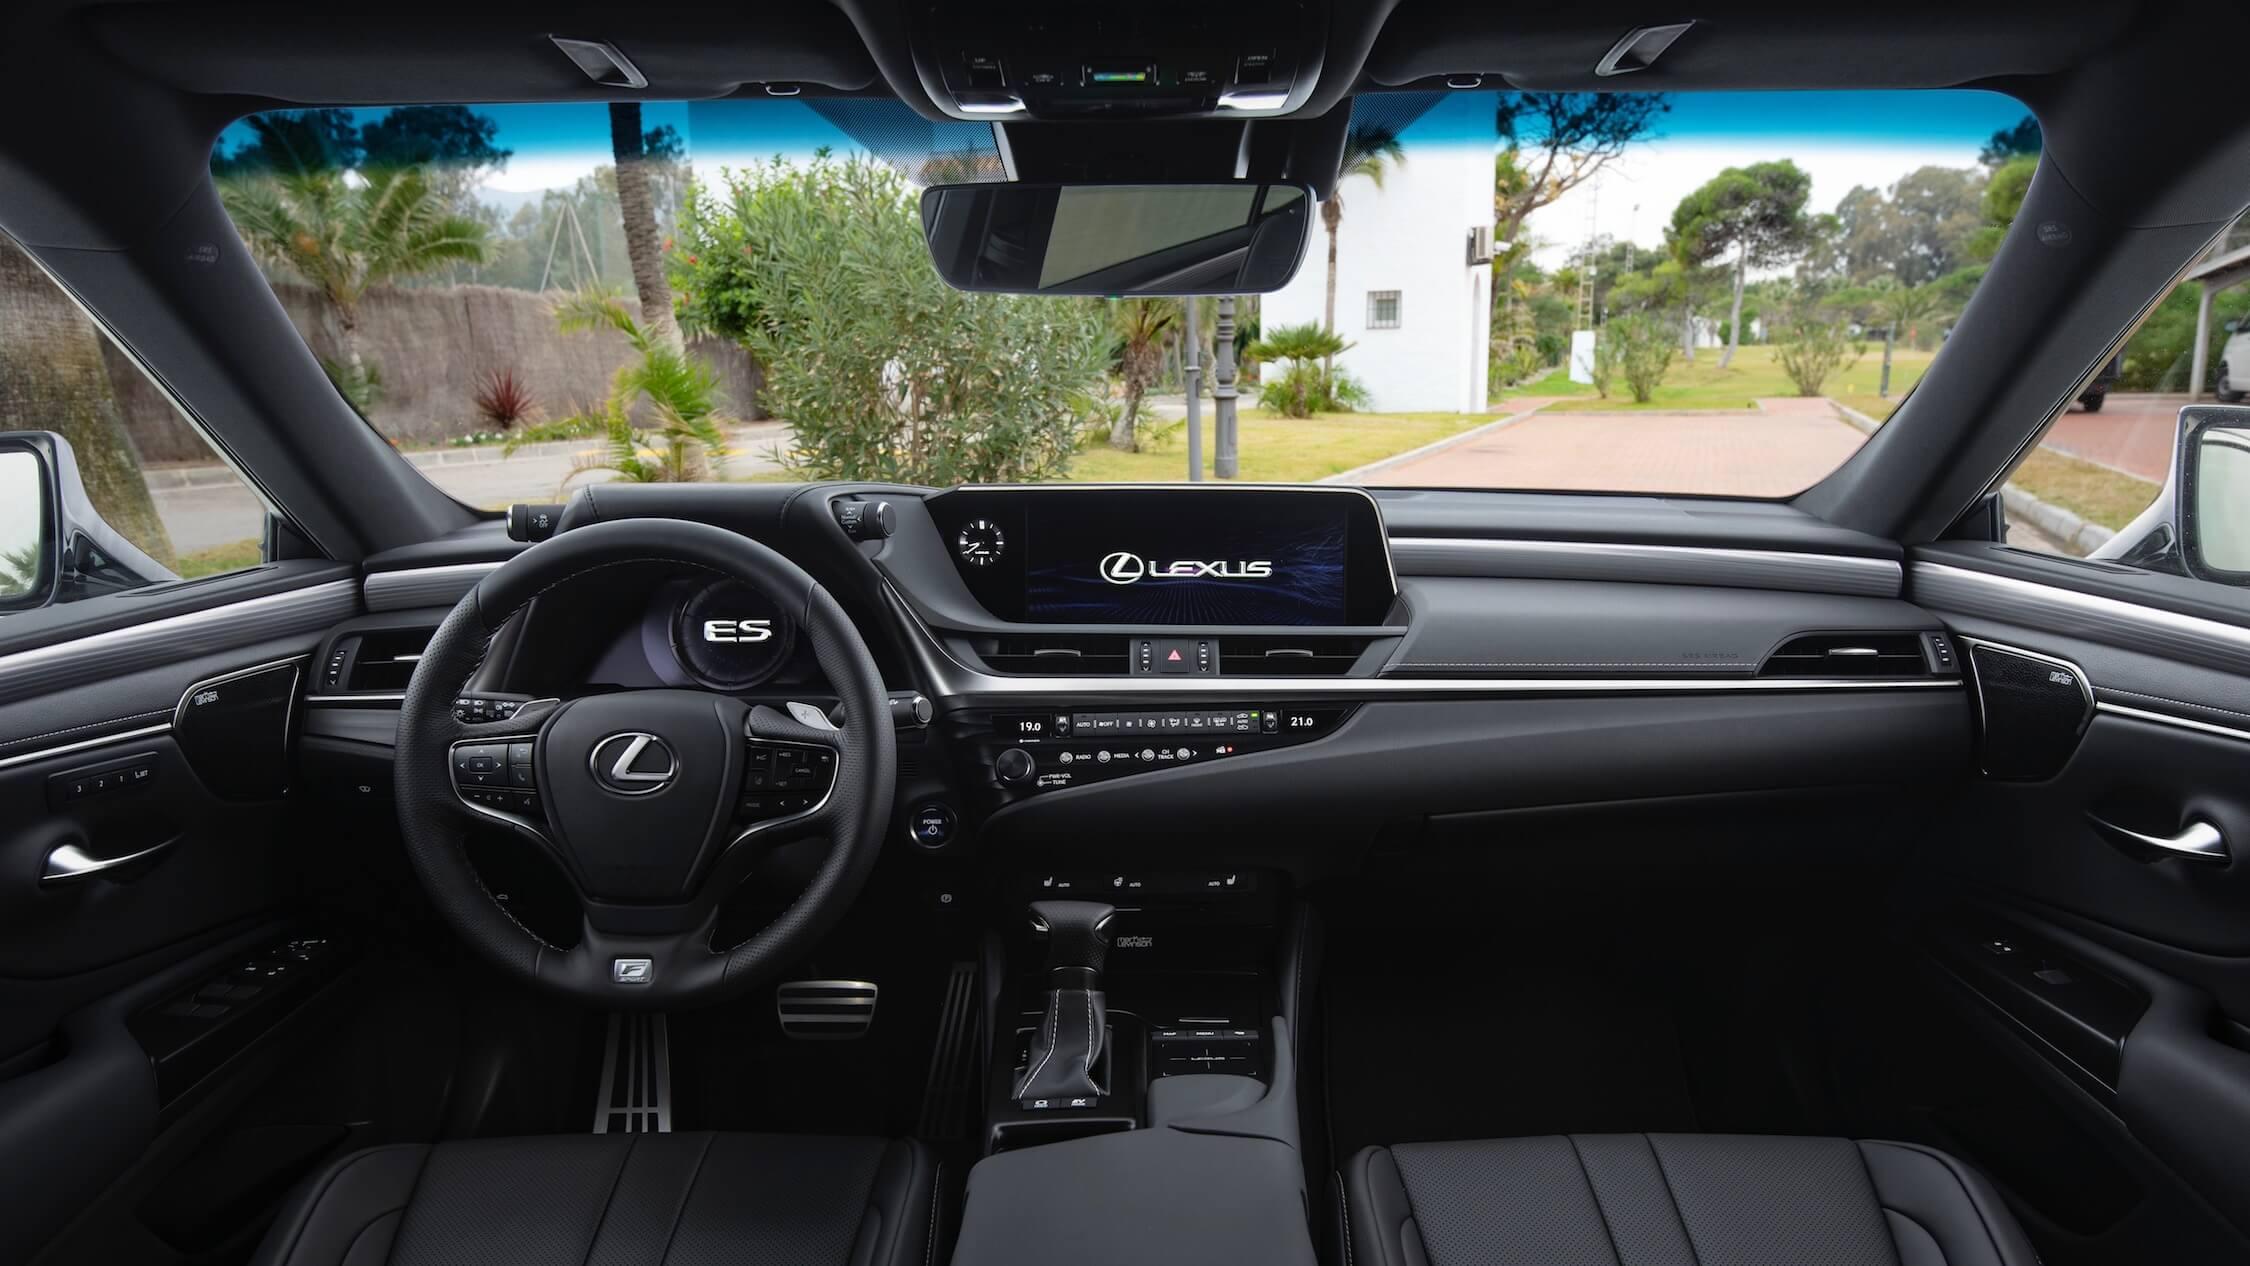 Lexus ES 300h interieur dashboard